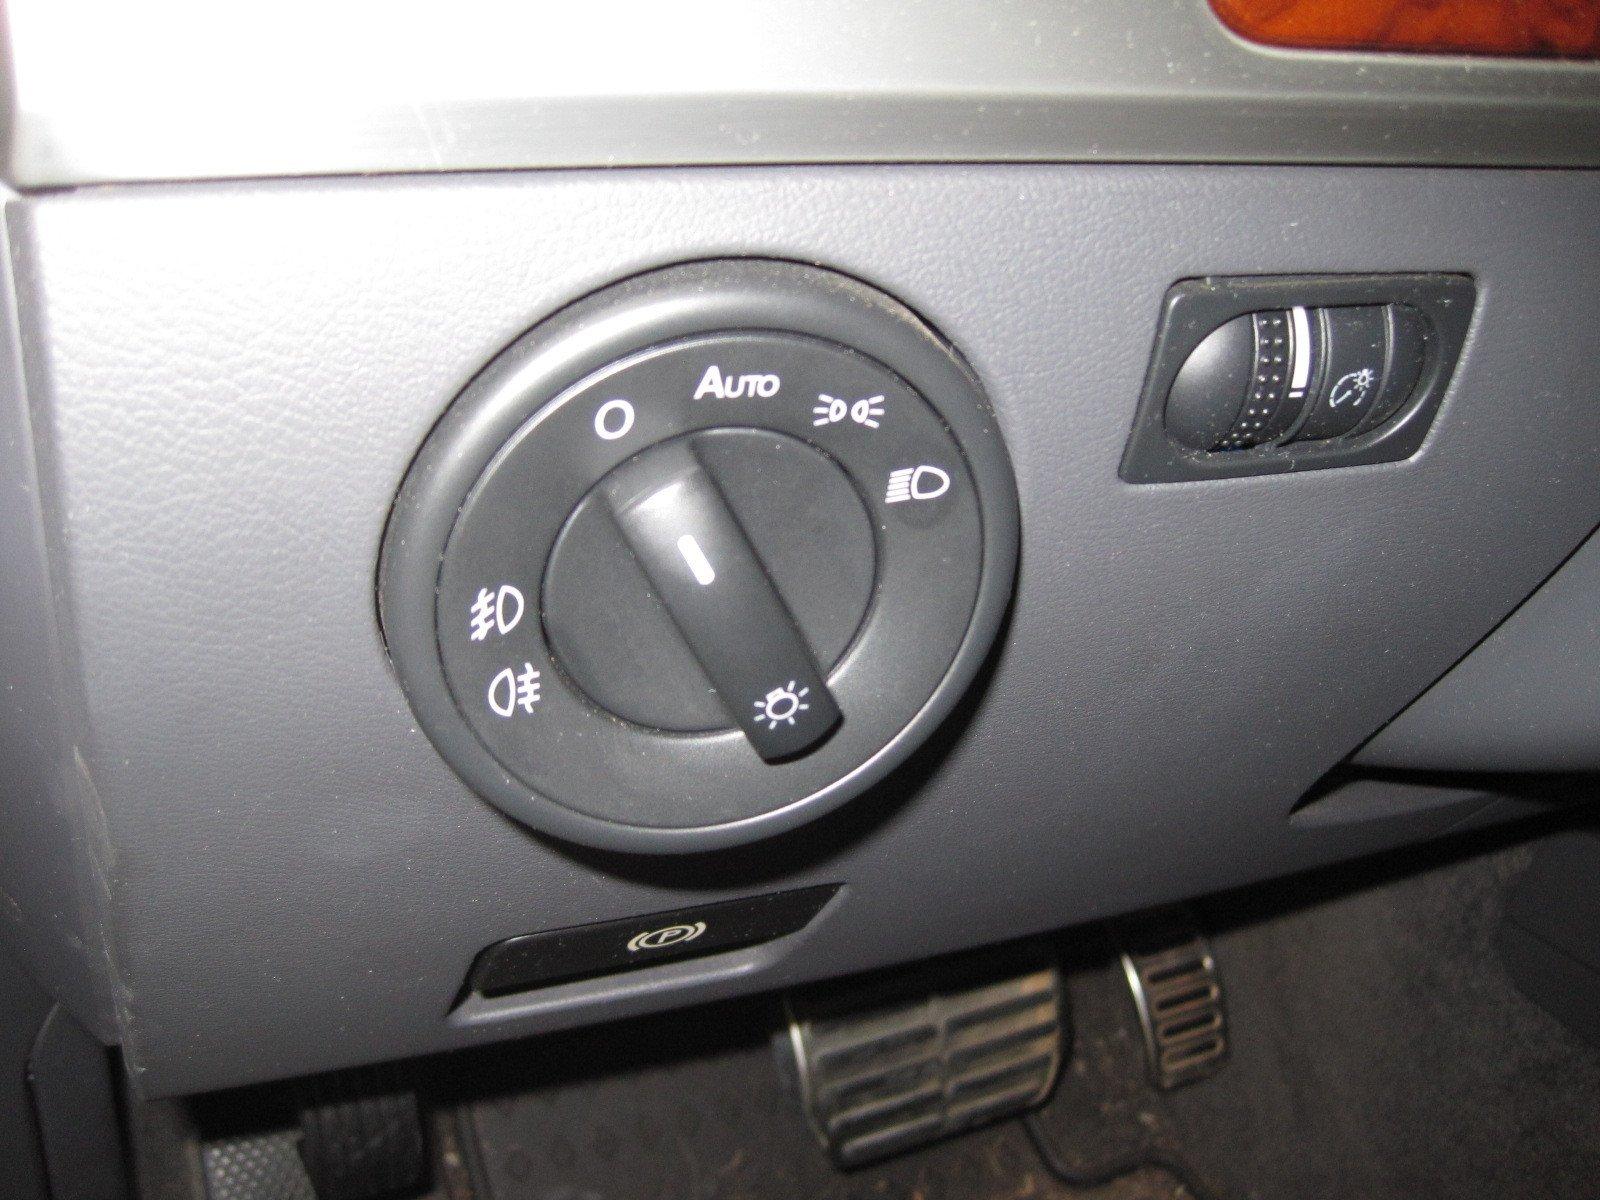 2004 2010 Volkswagen Touareg European Headlight Switch Replacement 2004 2005 2006 2007 2008 2009 2010 Ifixit Repair Guide